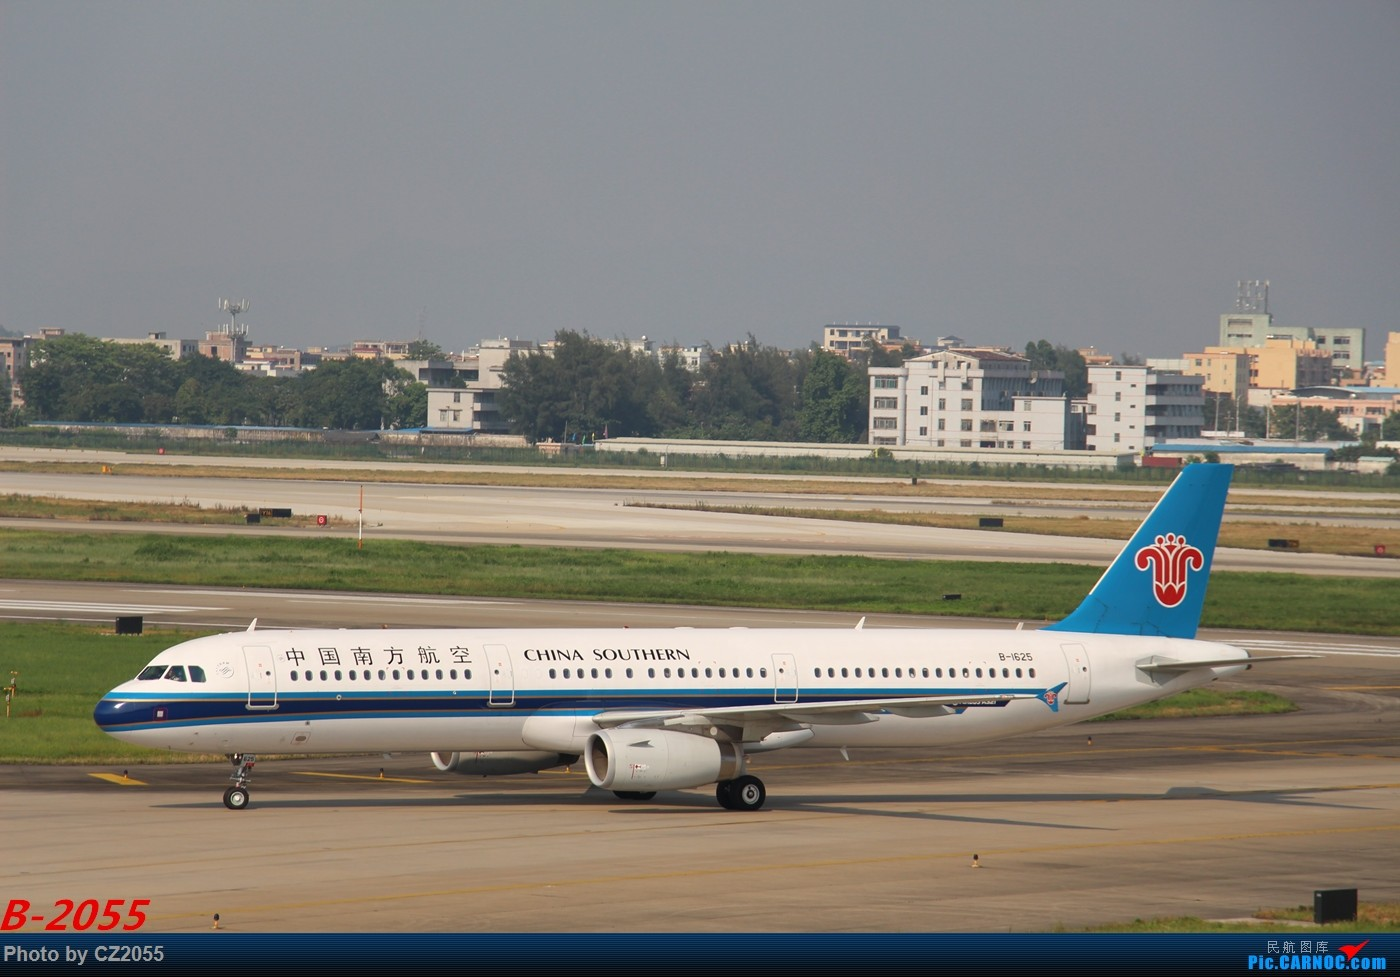 Re:[原创]Re:[原创]【广东青少年拍机小队】【C-Z-2055】发完737和宽体就升级320,那就再发一组320系列。 AIRBUS A321-200 B-1625 中国广州白云国际机场